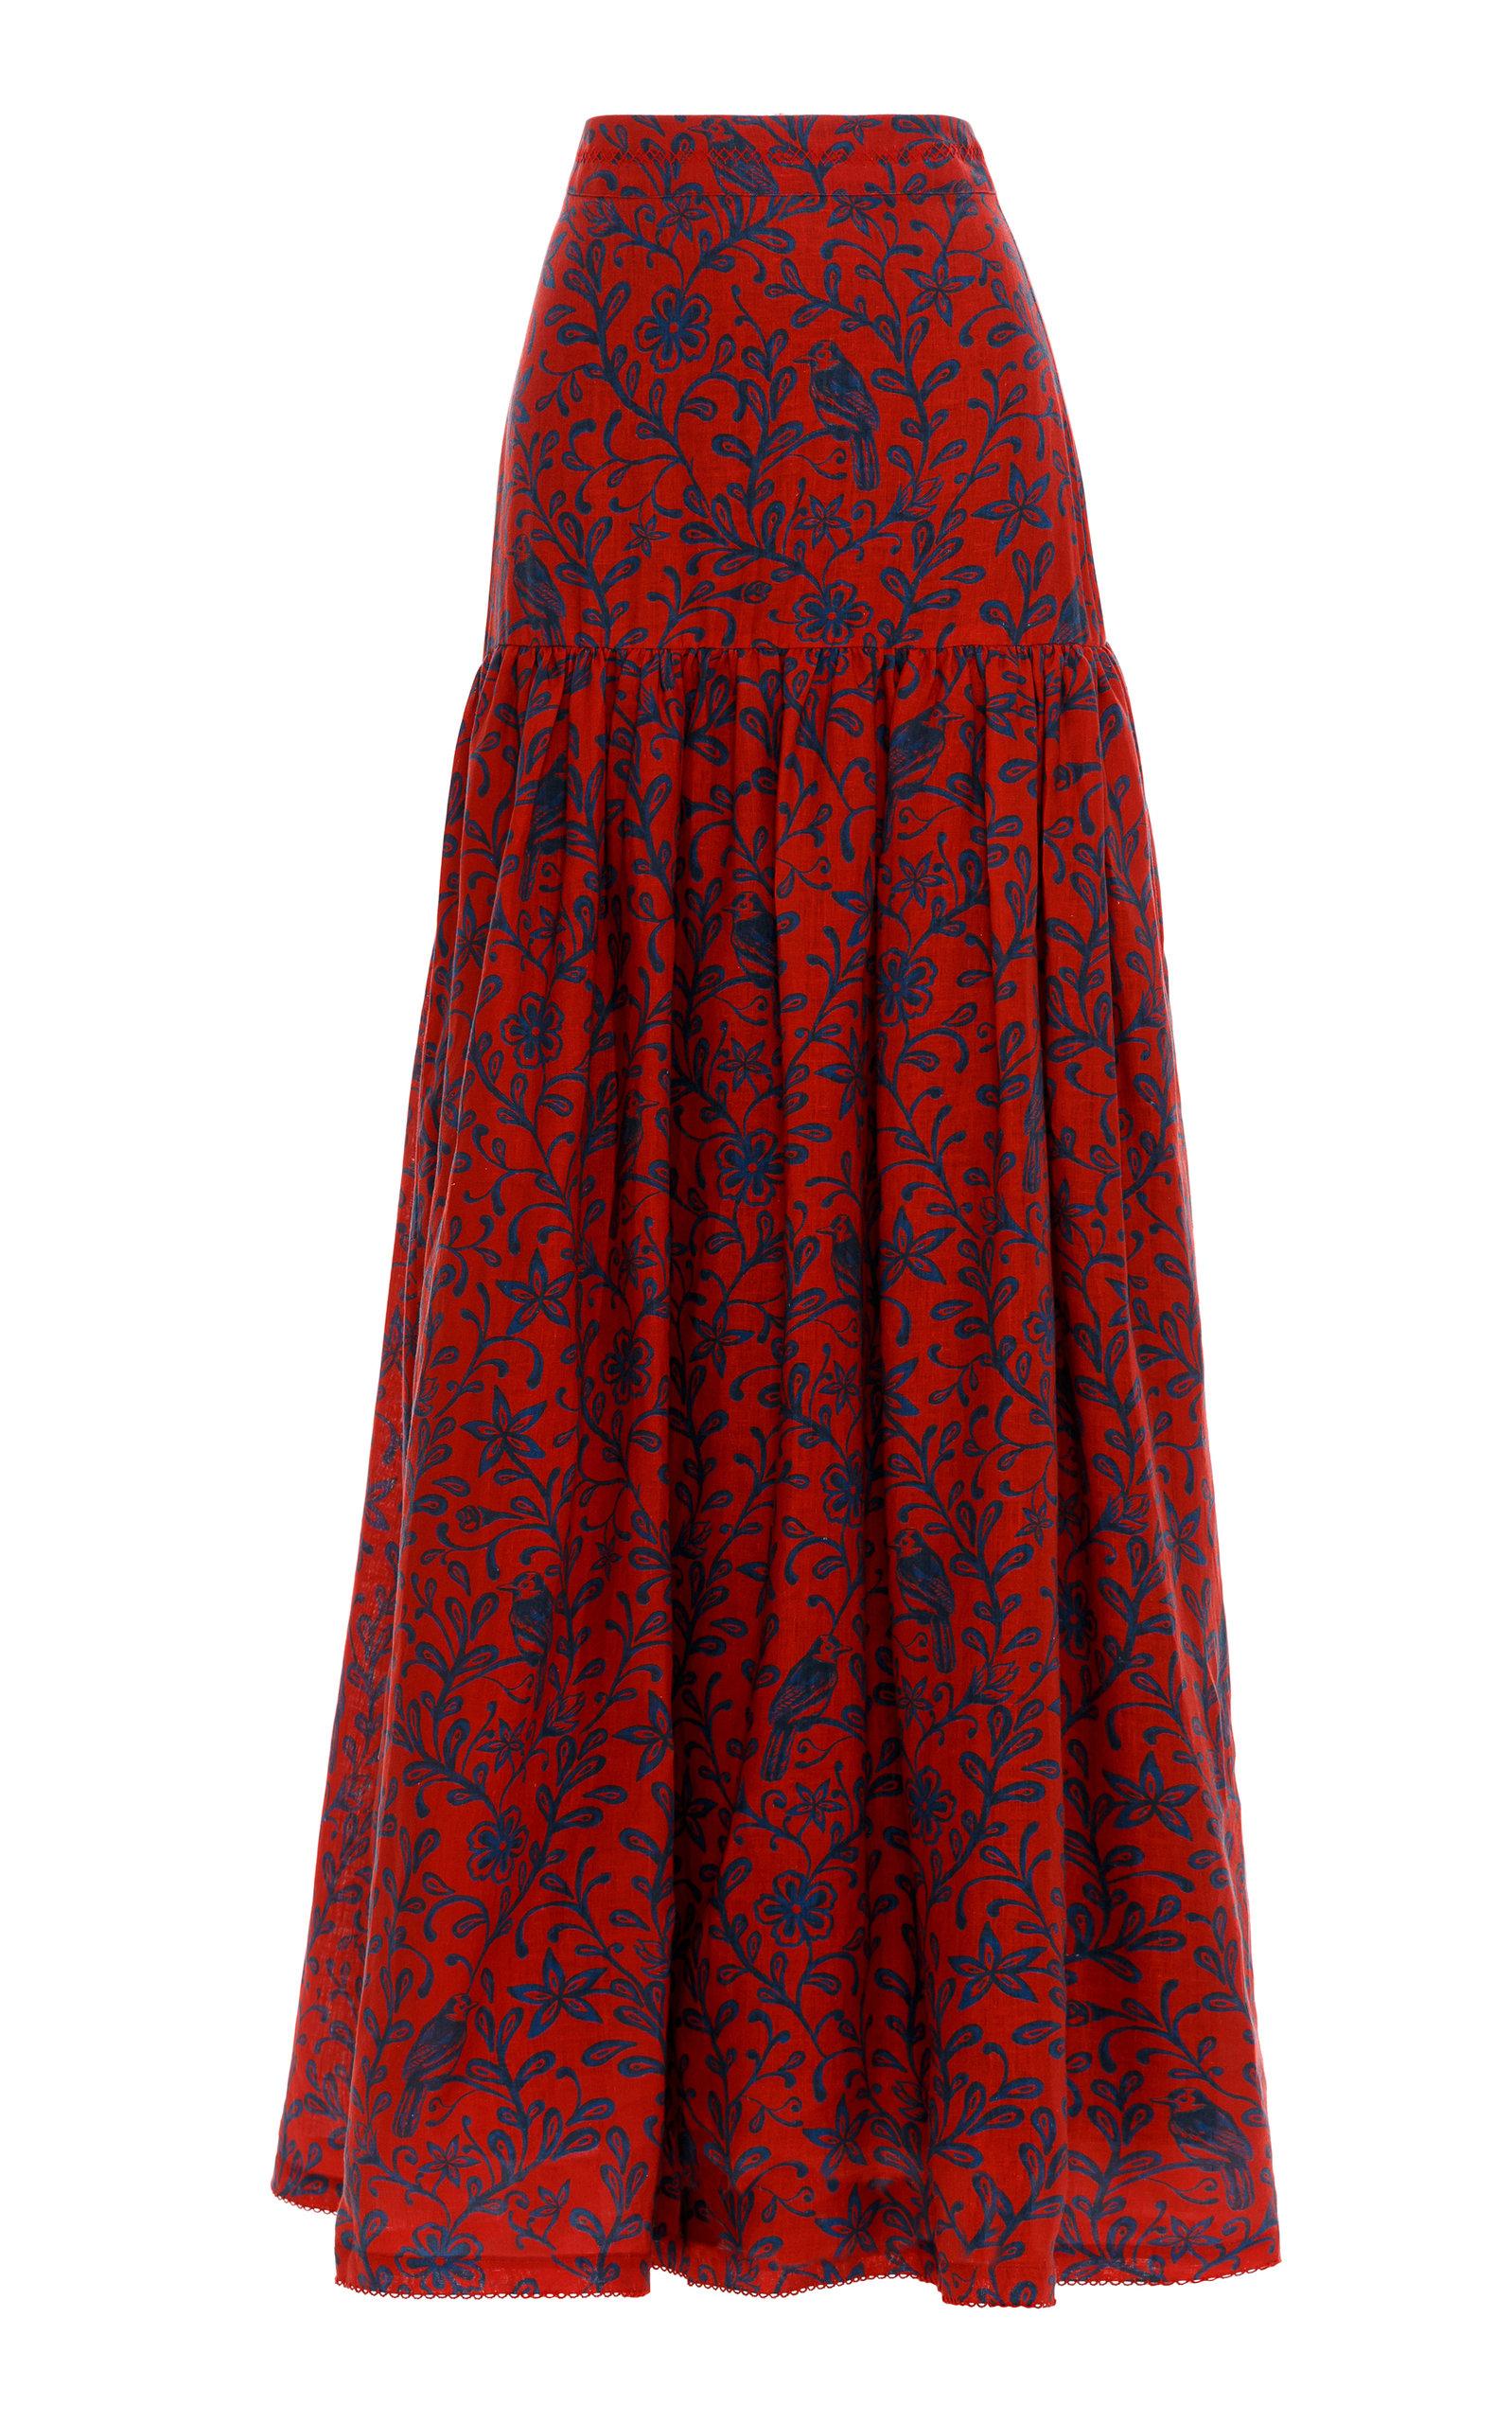 Women's Margarita Tiered Printed Linen Maxi Skirt